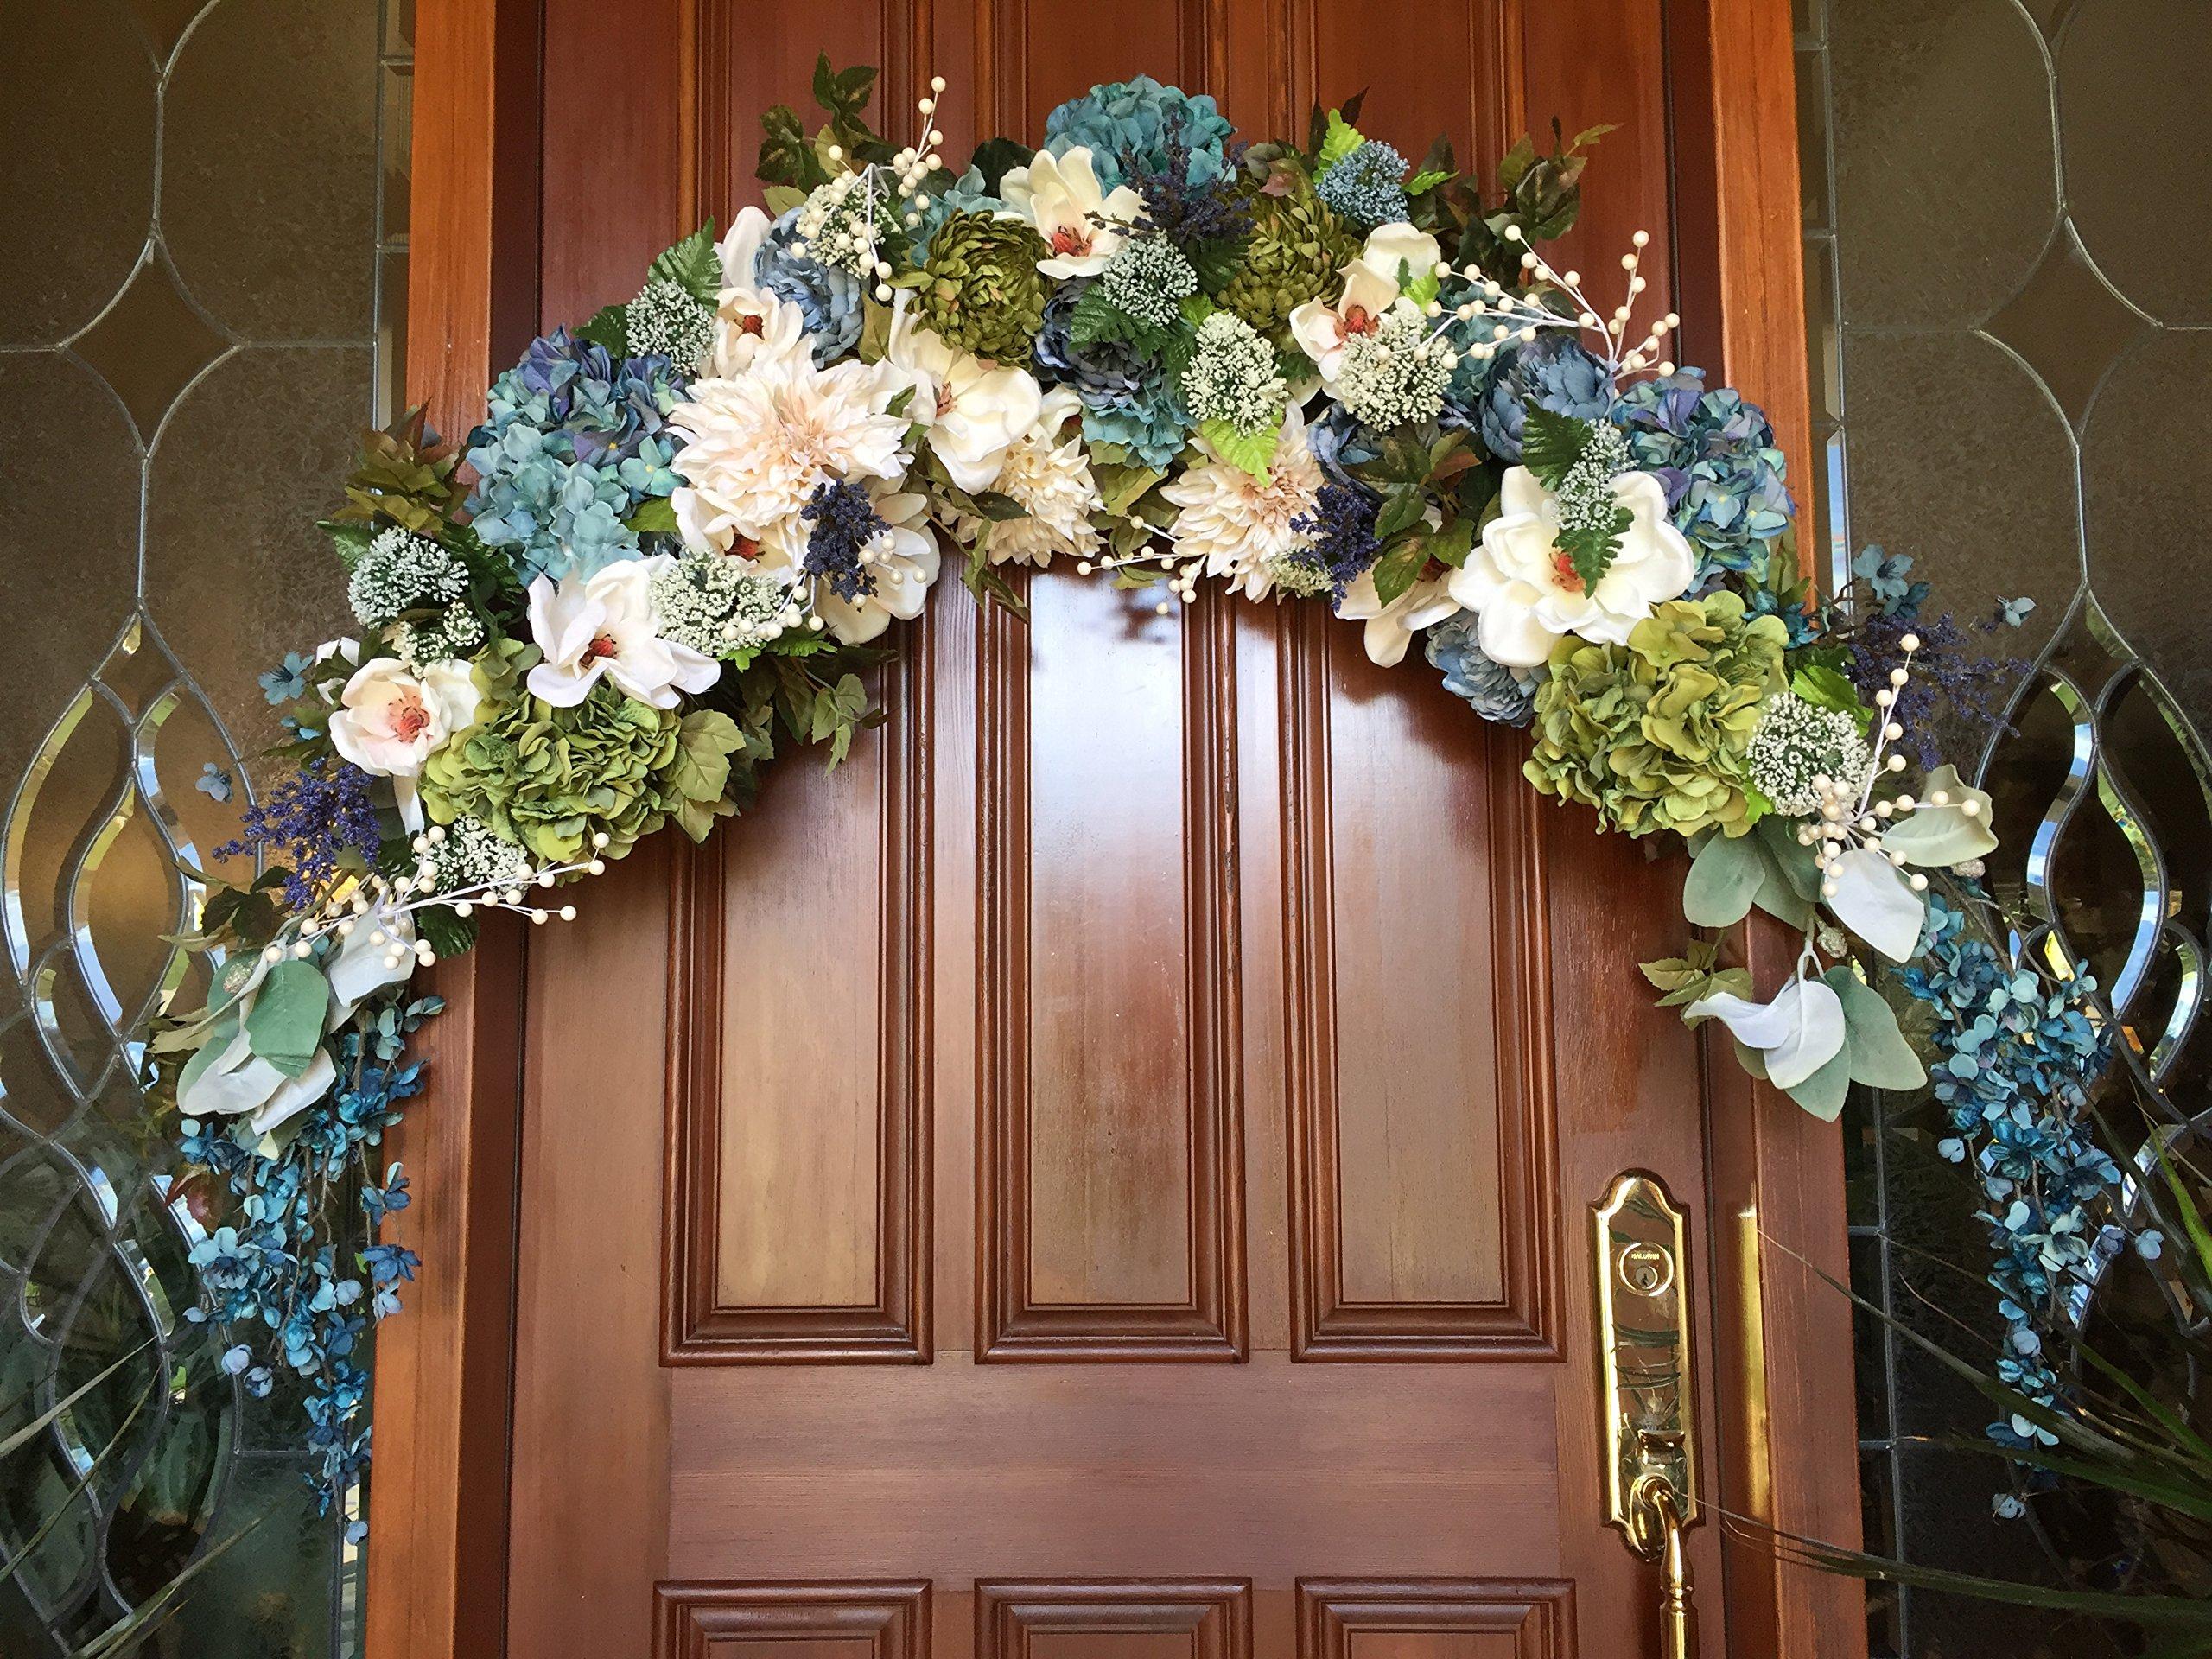 Floral Wedding Arch, Bridal Floral Arch, Floral Bridal Swag, Beach Wedding Floral Arch, Floral Swag, Wedding Floral, Elegant Floral Swag by Beauty & the BLOOM